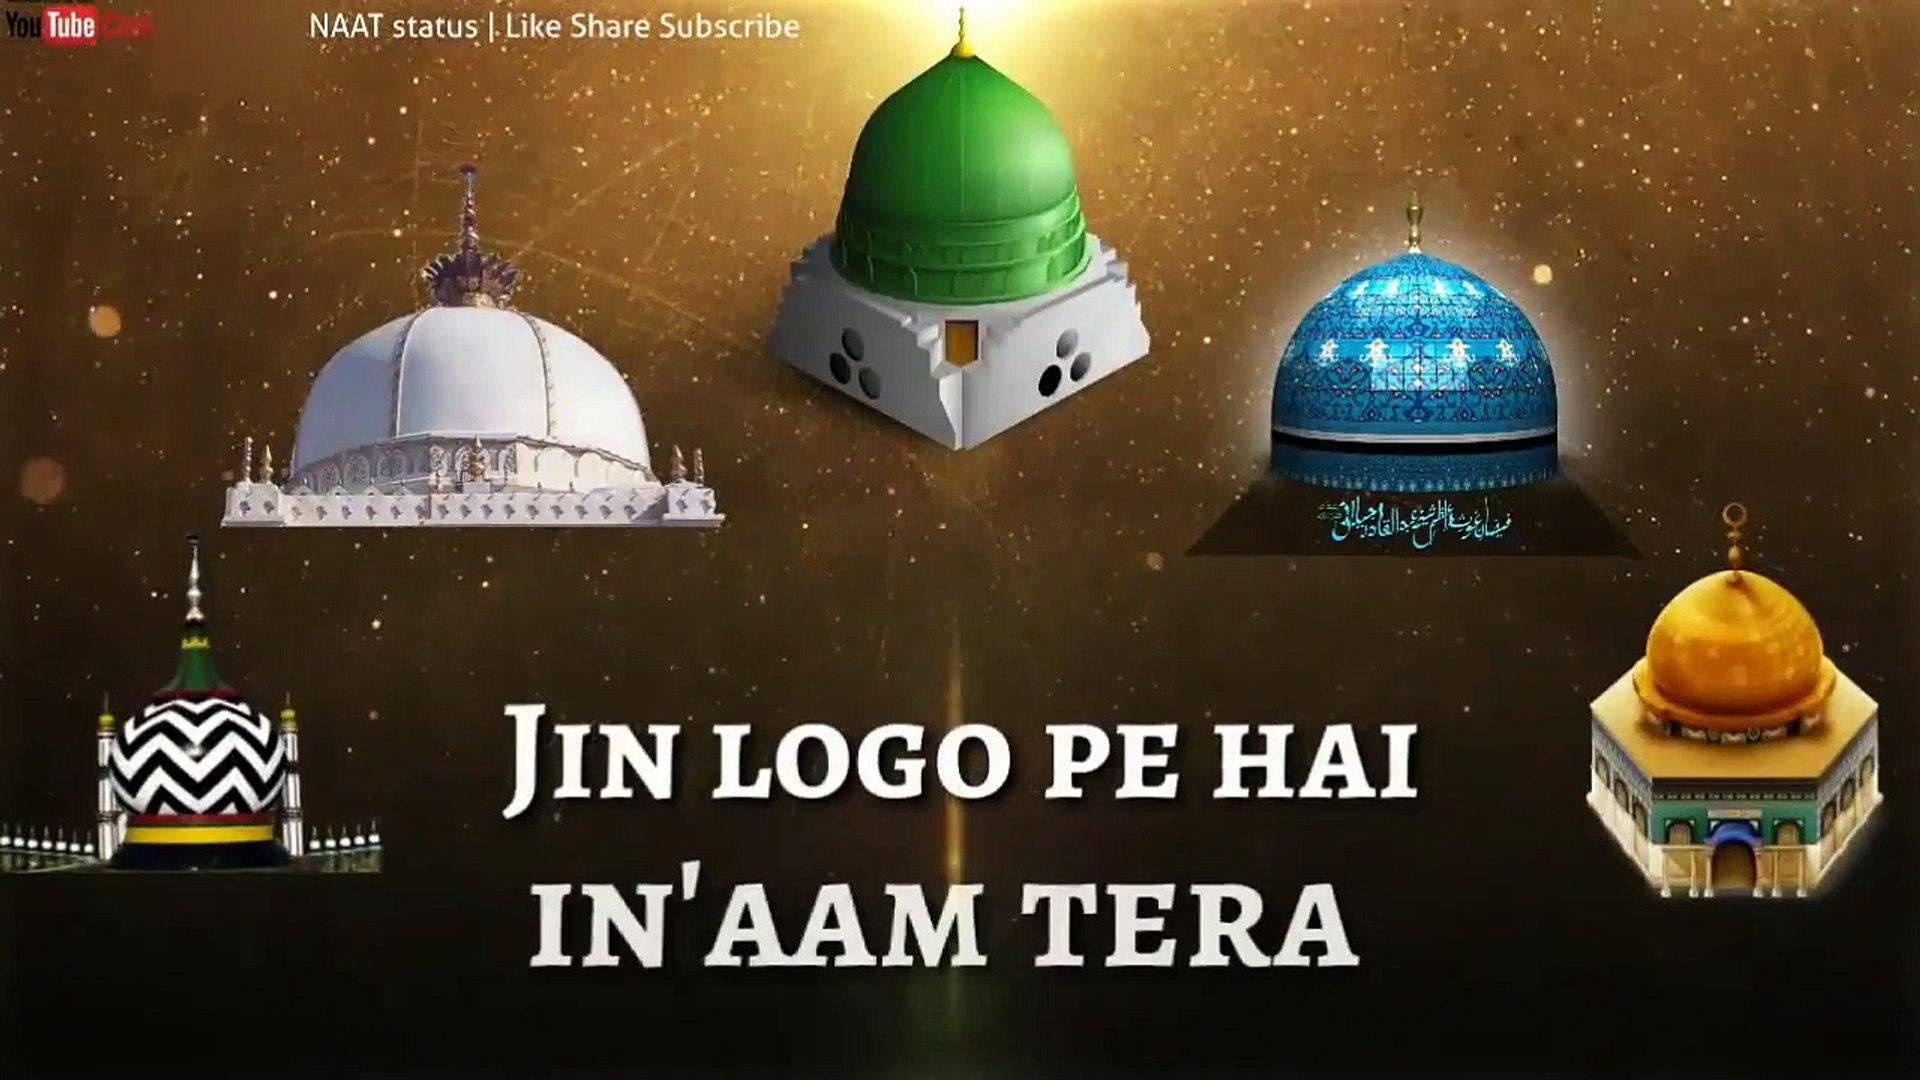 Allah Karam Naat Whatsapp Status 2018